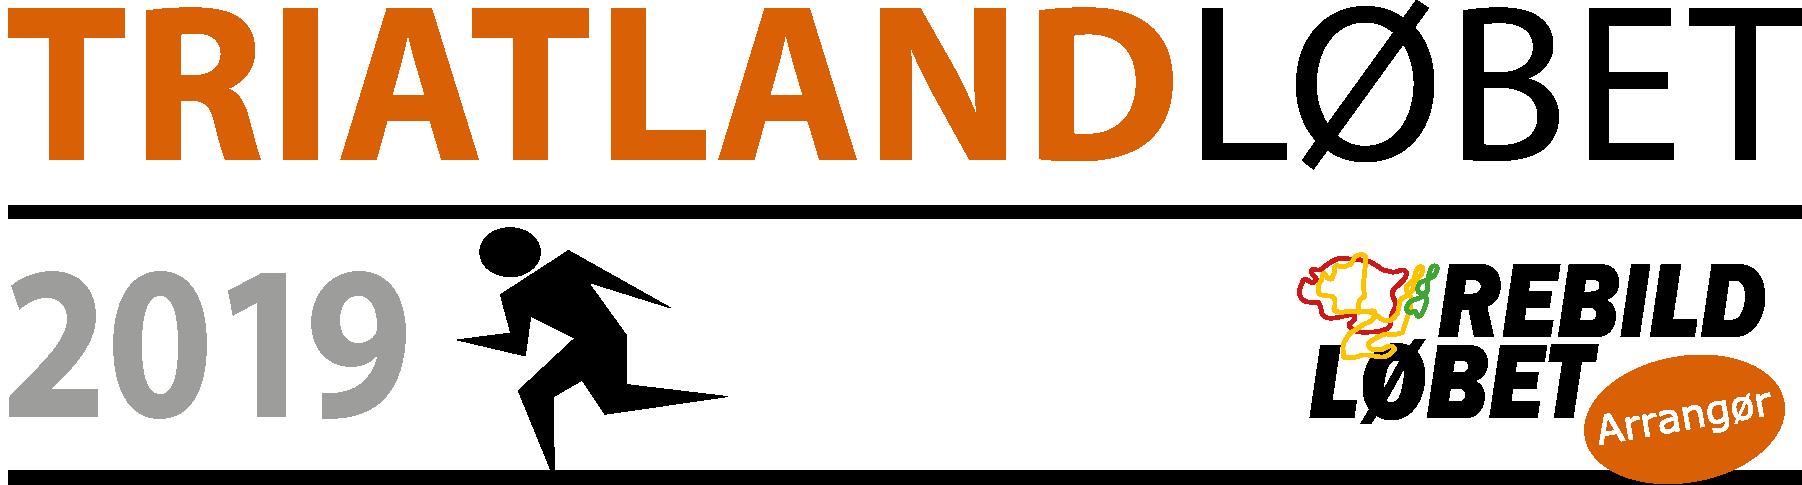 Triatlandløbet 2019